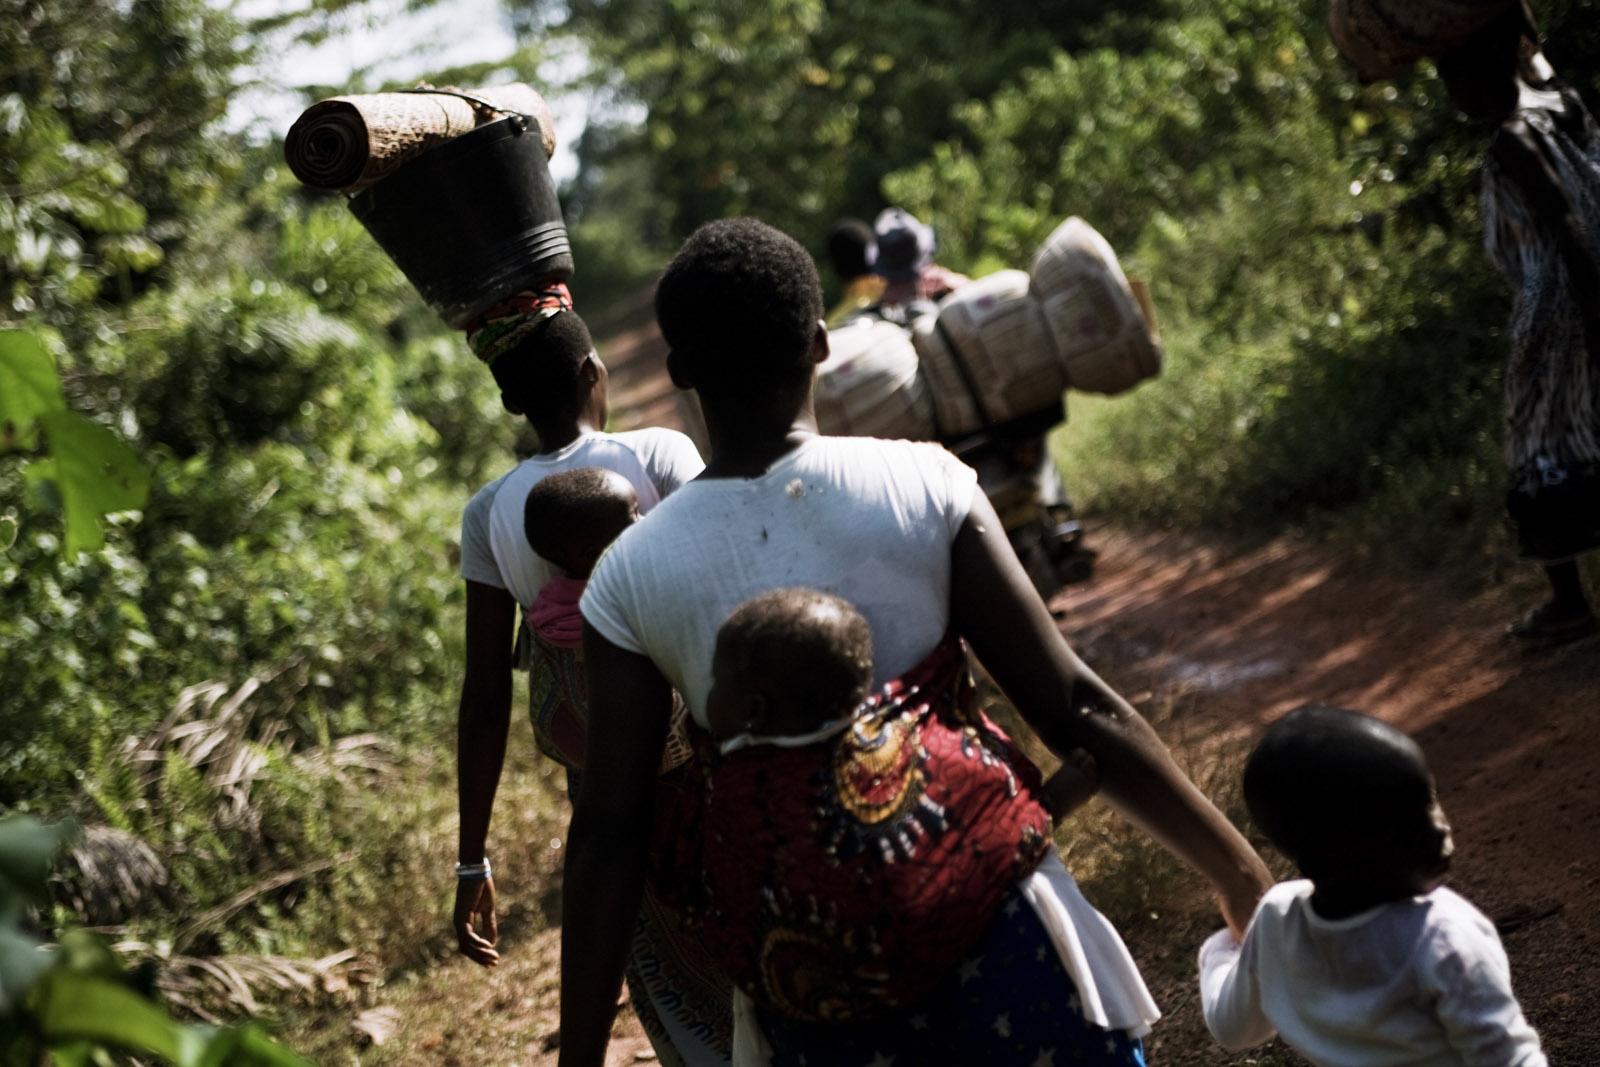 liberia-refugies-ivoiriens-0311-9744hd